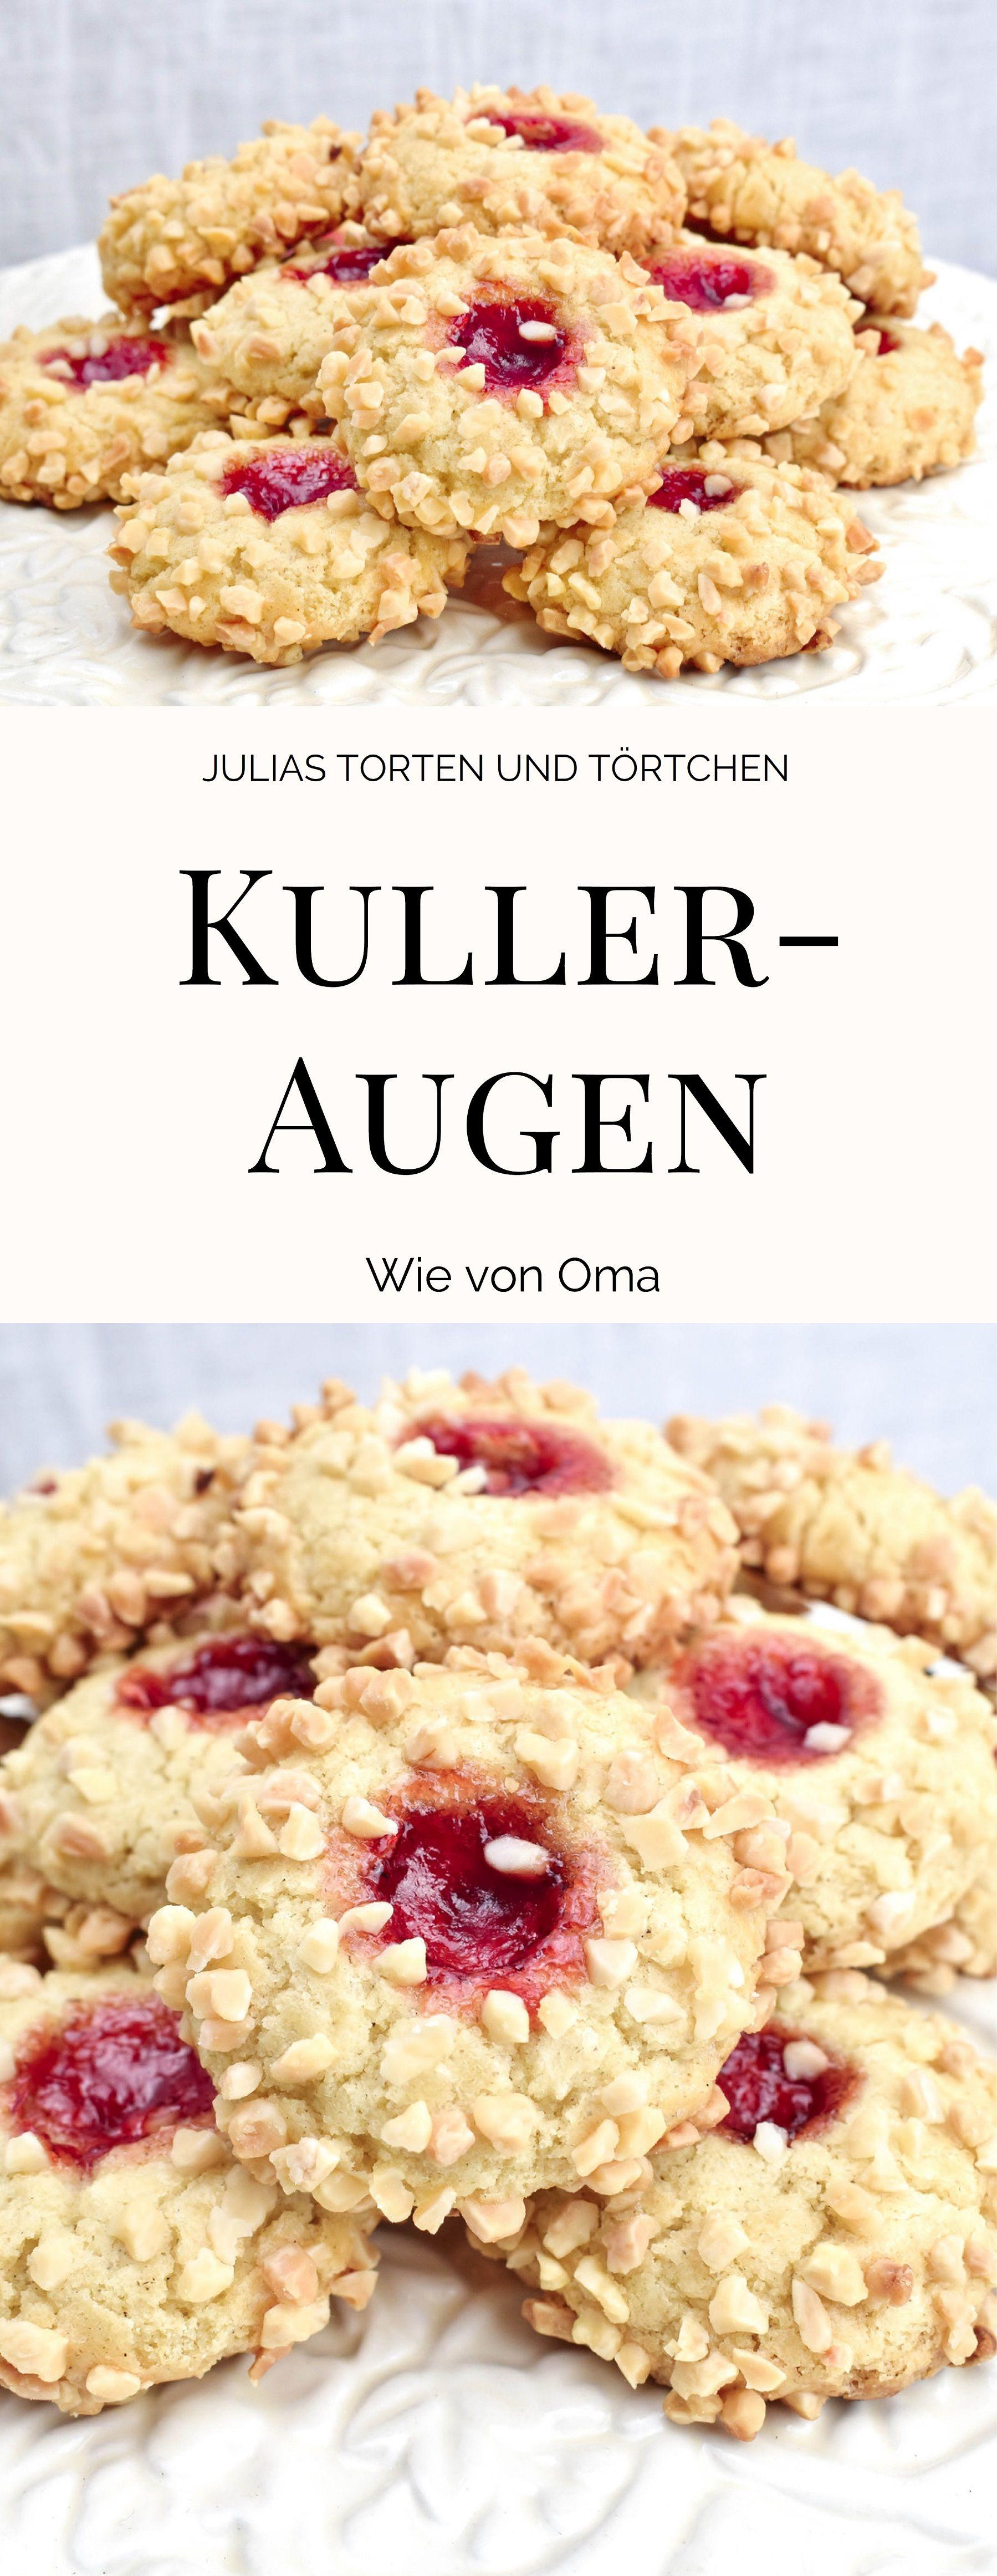 Kulleraugen | Rezepte, Kekse rezept einfach, Plätzchen rezept